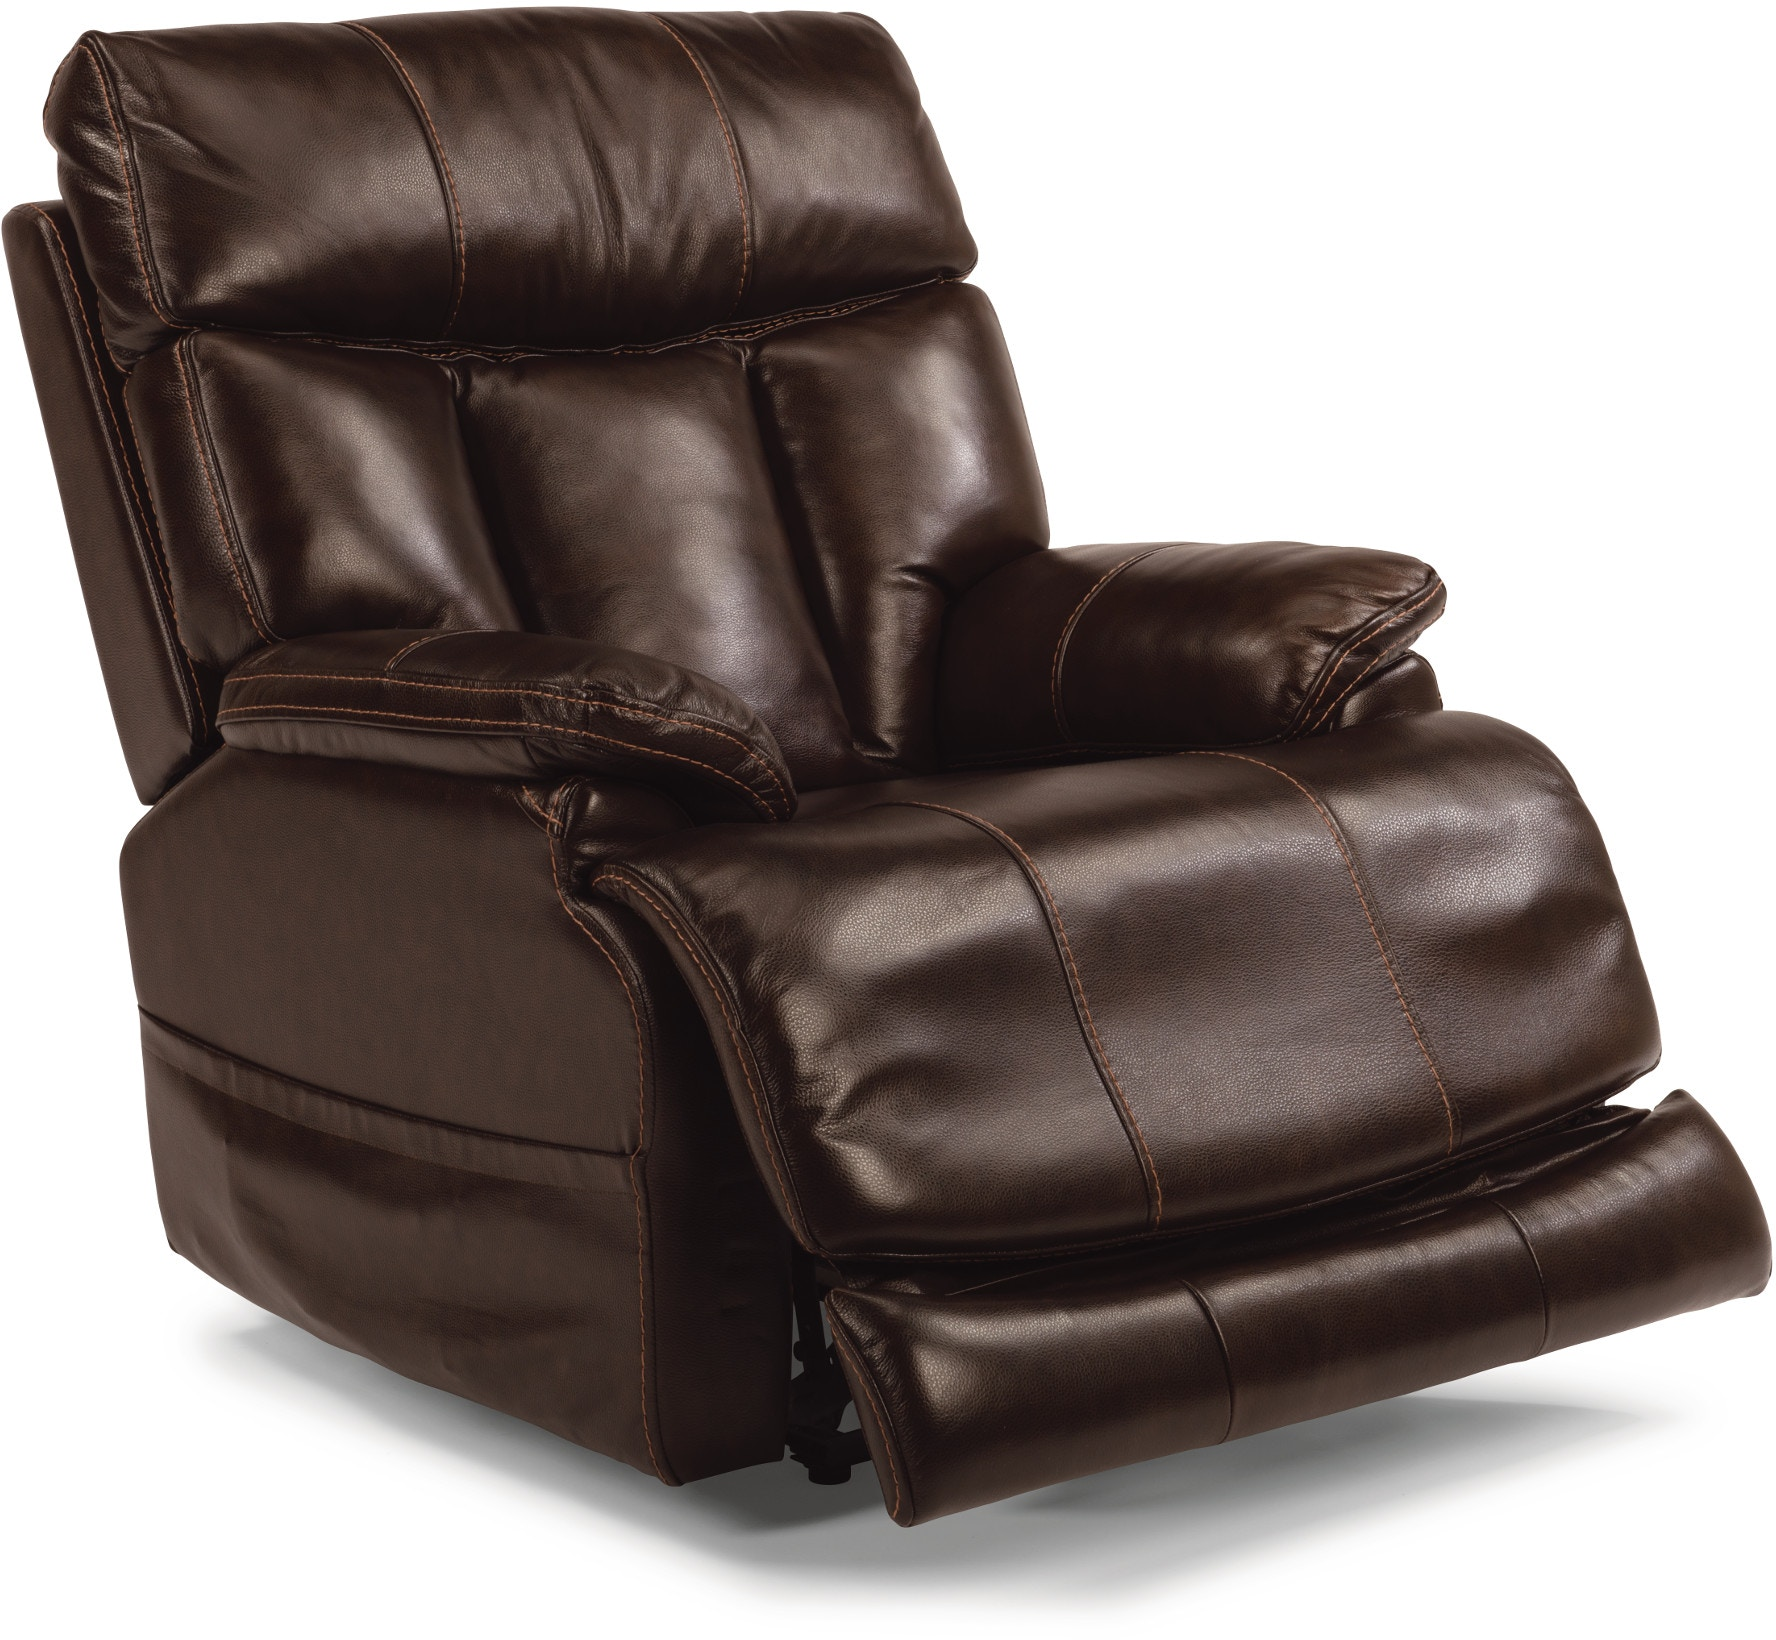 Flexsteel Living Room Lumbar Power Headrest and Lumbar Leather